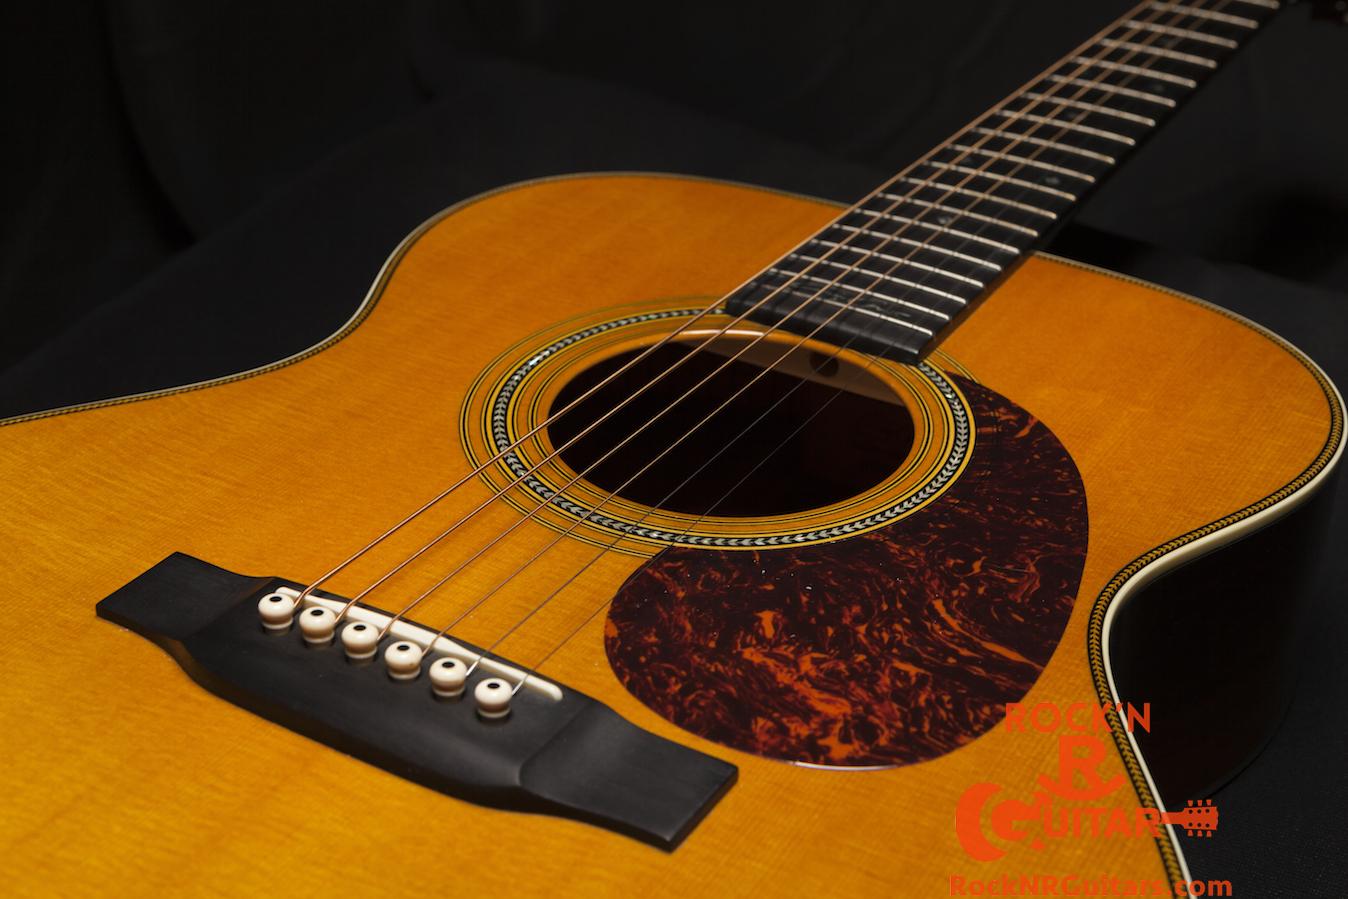 rock 39 n r guitars martin guitar limited edition model 000 28 ecb eric clapton number 366 of 500. Black Bedroom Furniture Sets. Home Design Ideas